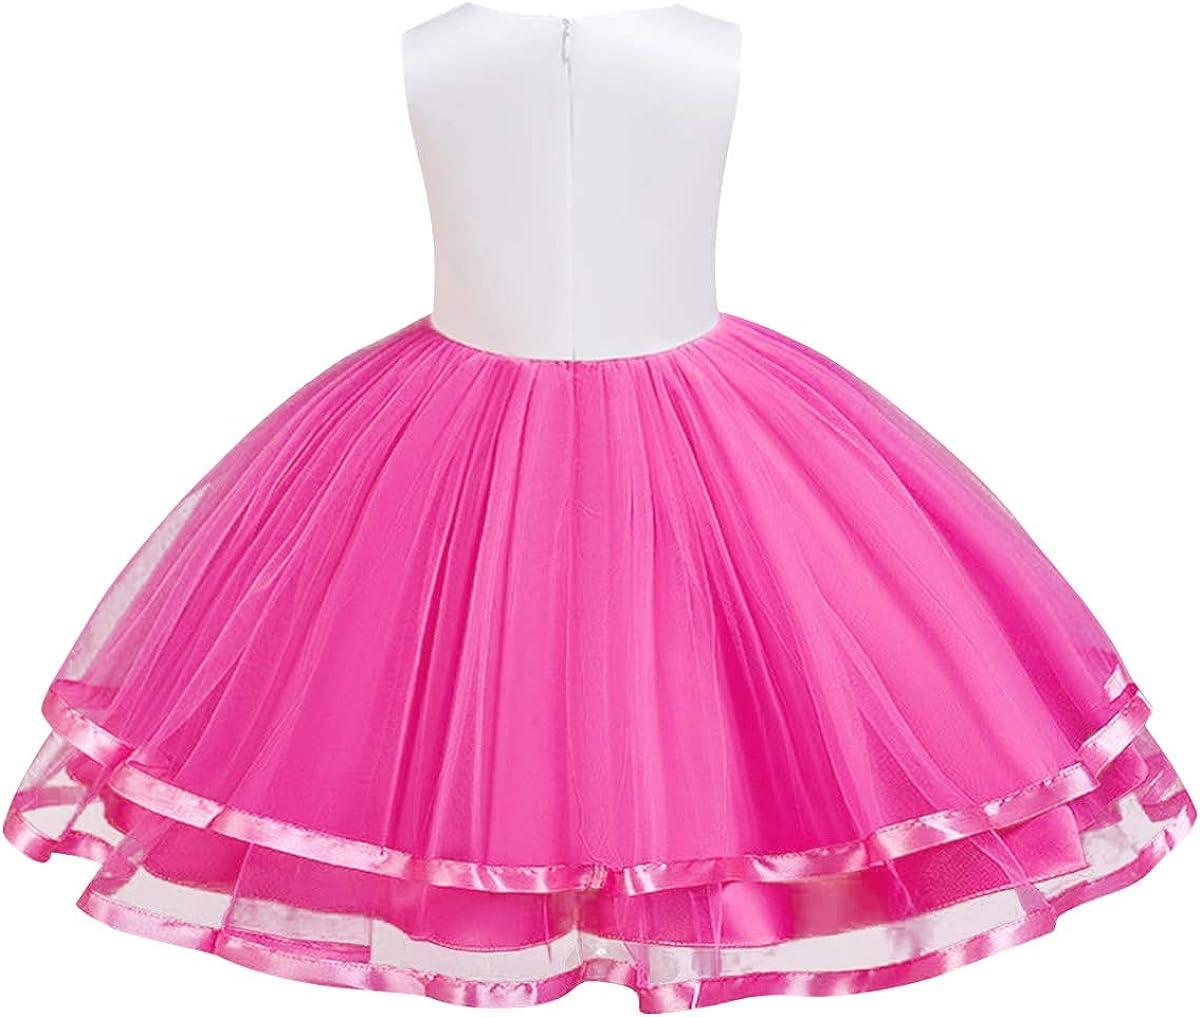 HenzWorld Unicorn Tutu Dress Girls Princess Flower Wedding Birthday Party Outfit Pageant Dresses